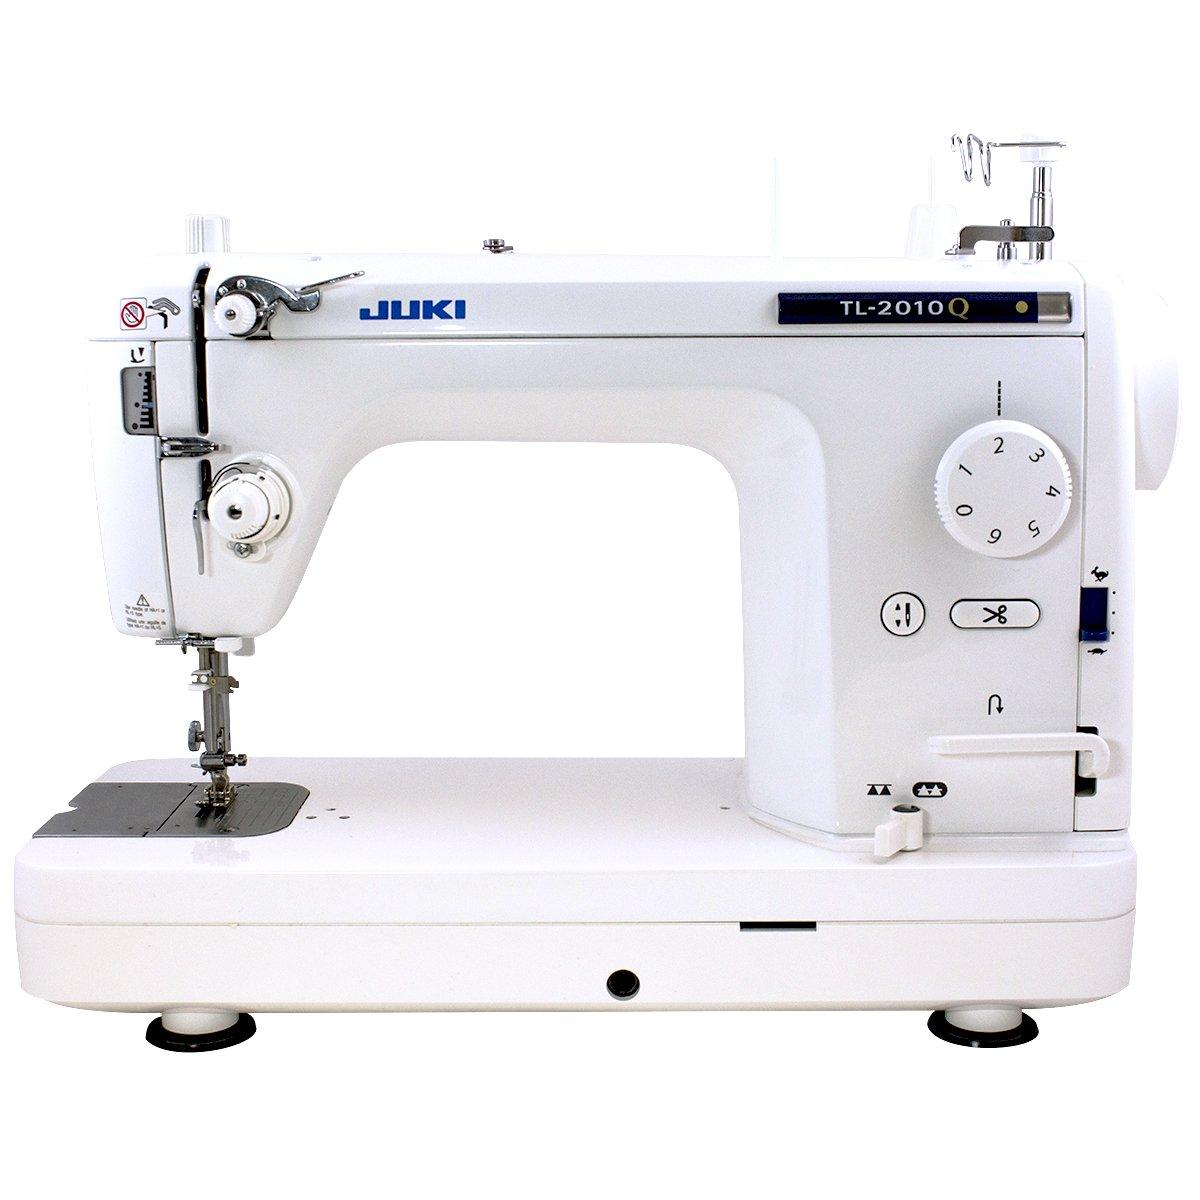 Juki TL-2010Q 1 portable sewing machine